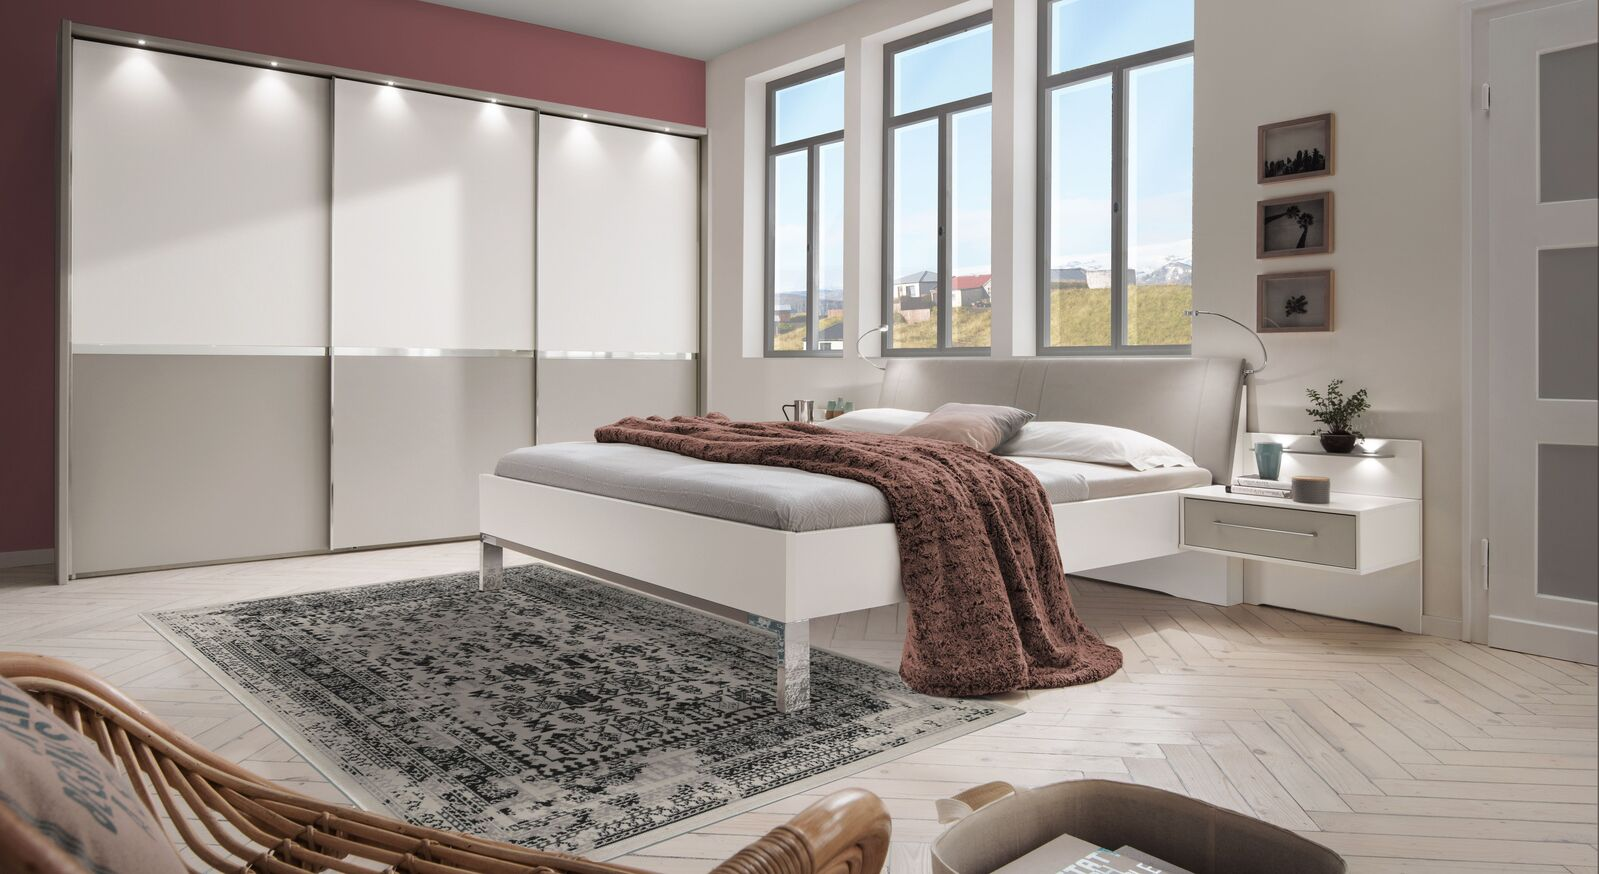 Komplett-Schlafzimmer Tulsa in angesagter Farbkombination